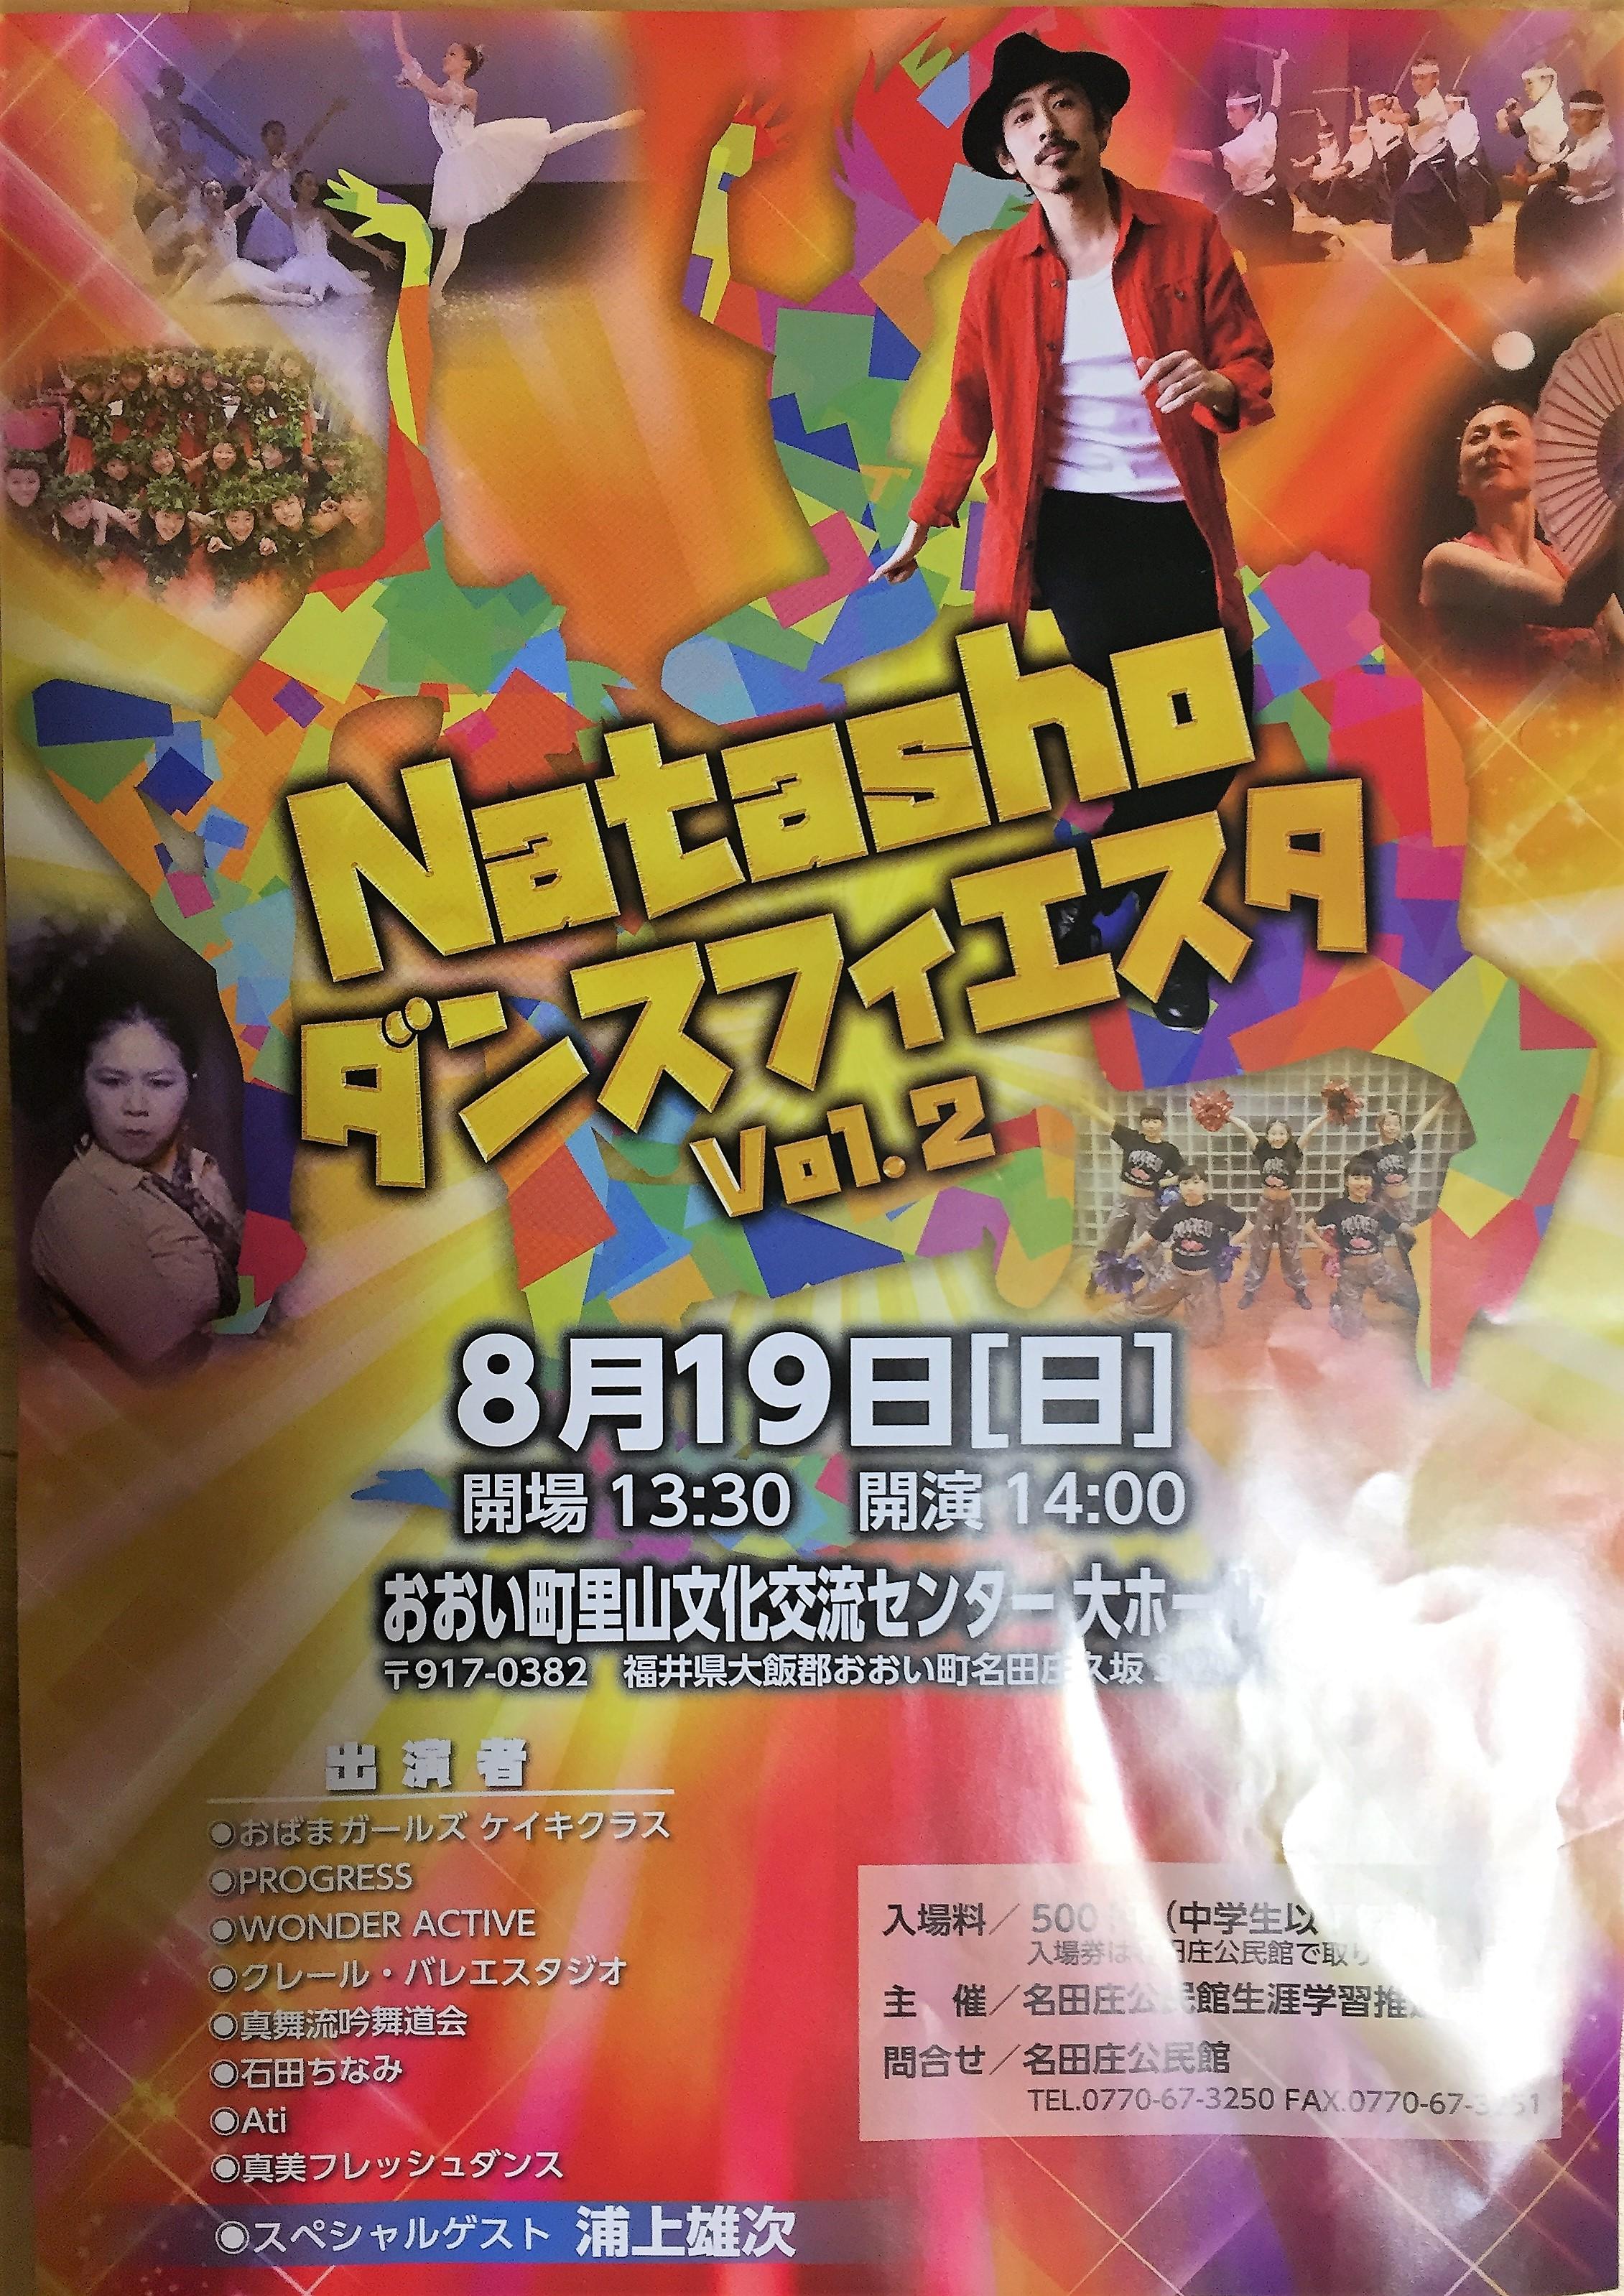 2018 Natasho ダンスフィエスタ Vol.2(おおい町)